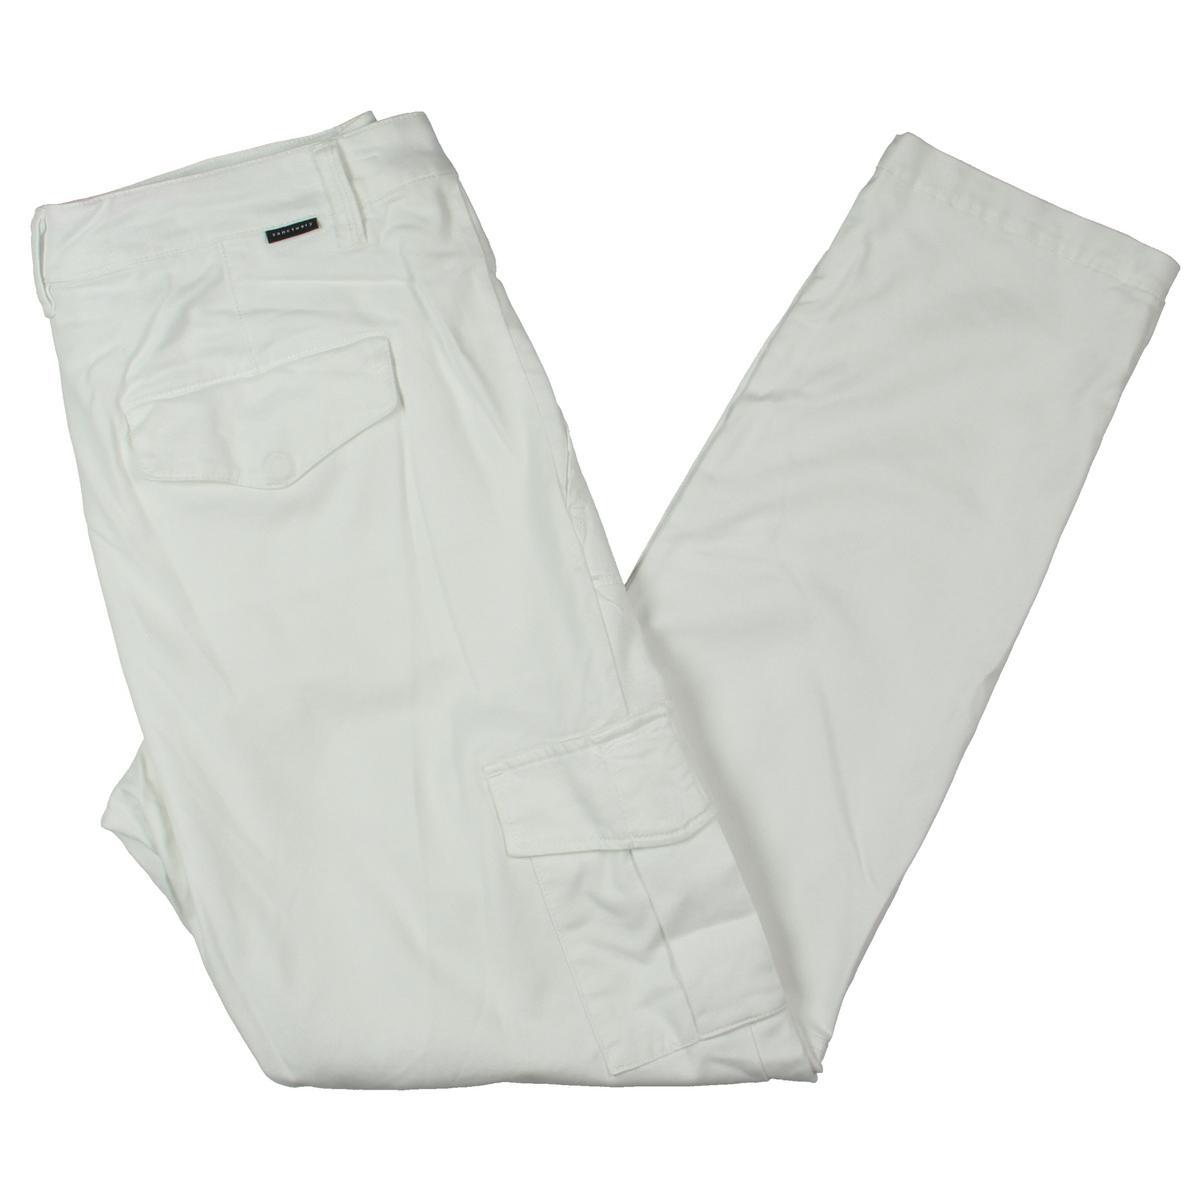 casual Utility bianco donna da Santuario 828605008791 Pantaloni lavoro Bhfo 9907 Bootcamp 31 da qf1xcEwg